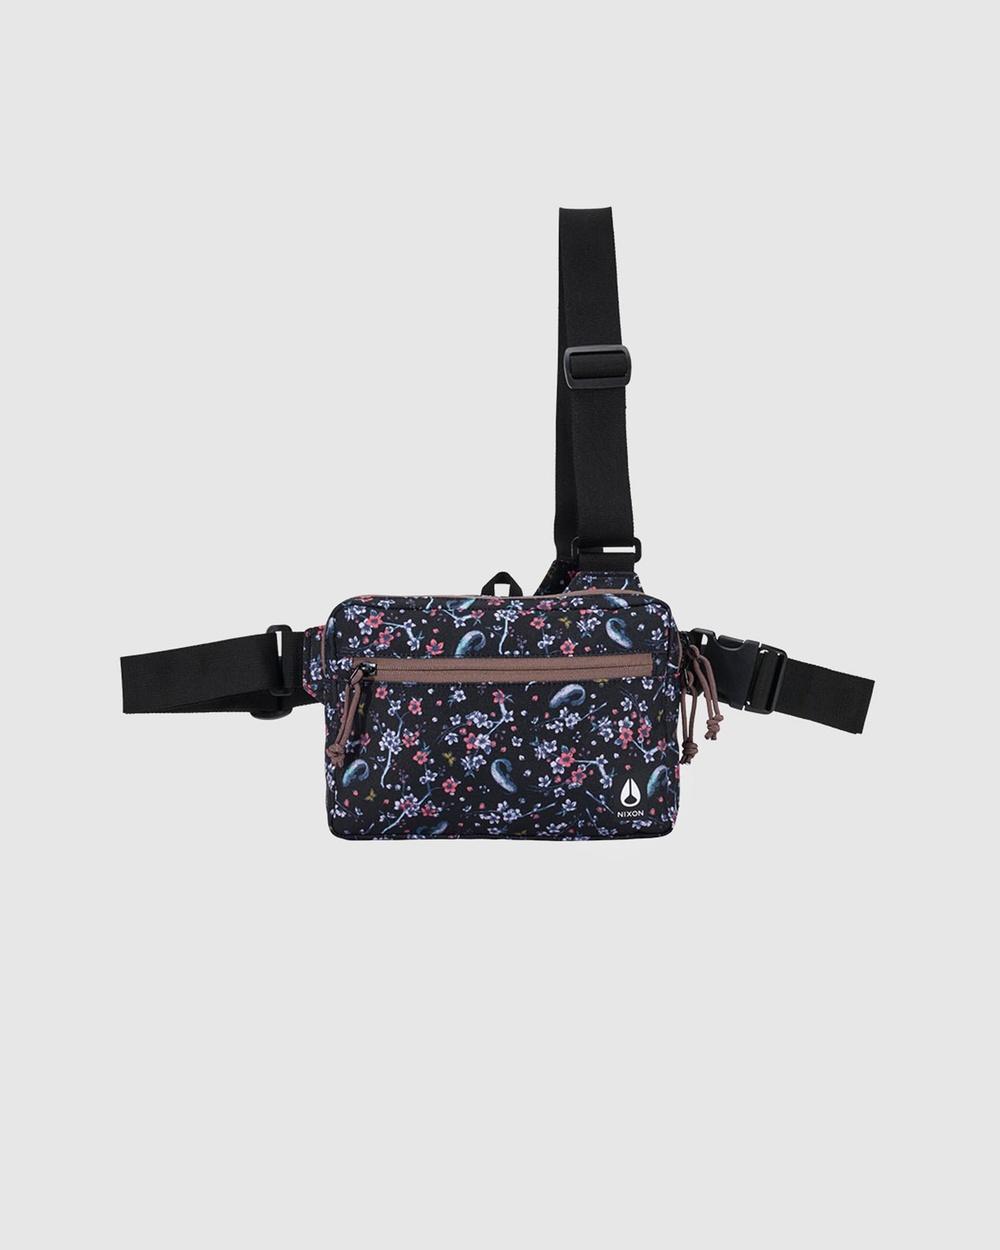 Nixon Bandit Bag Backpacks Cherry Blossom